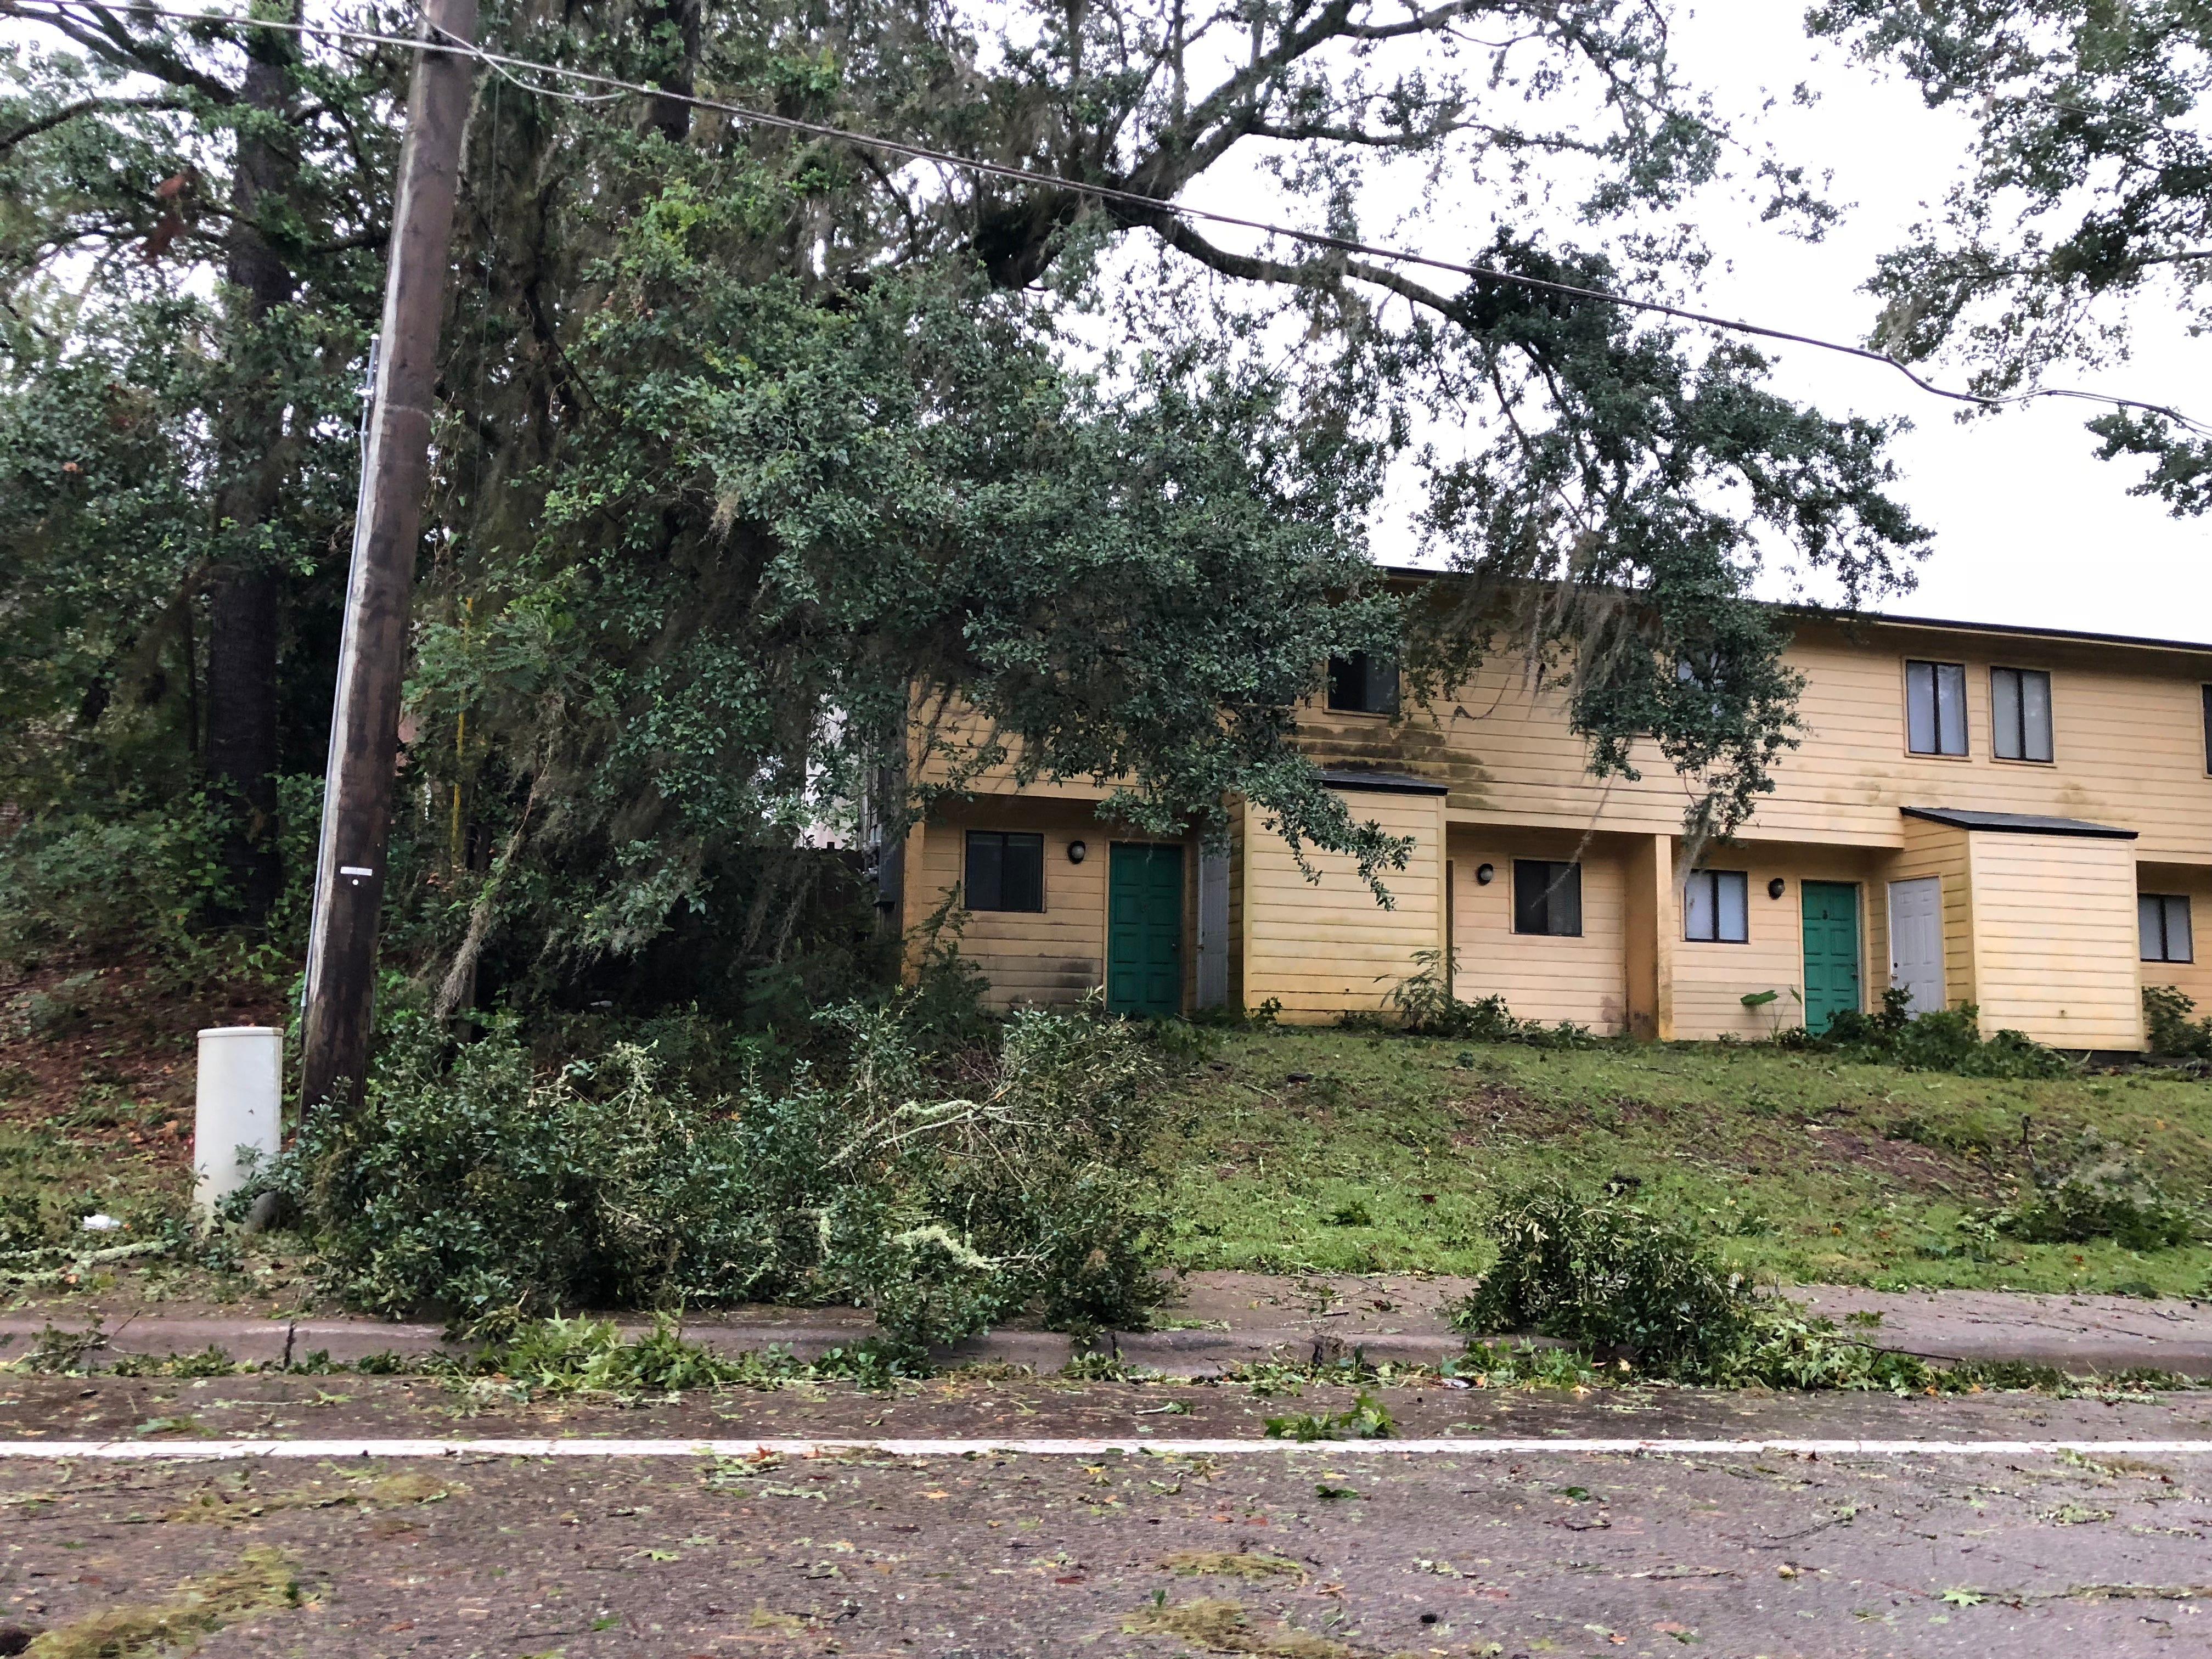 Debris off Sutor Road following Hurricane Michael.